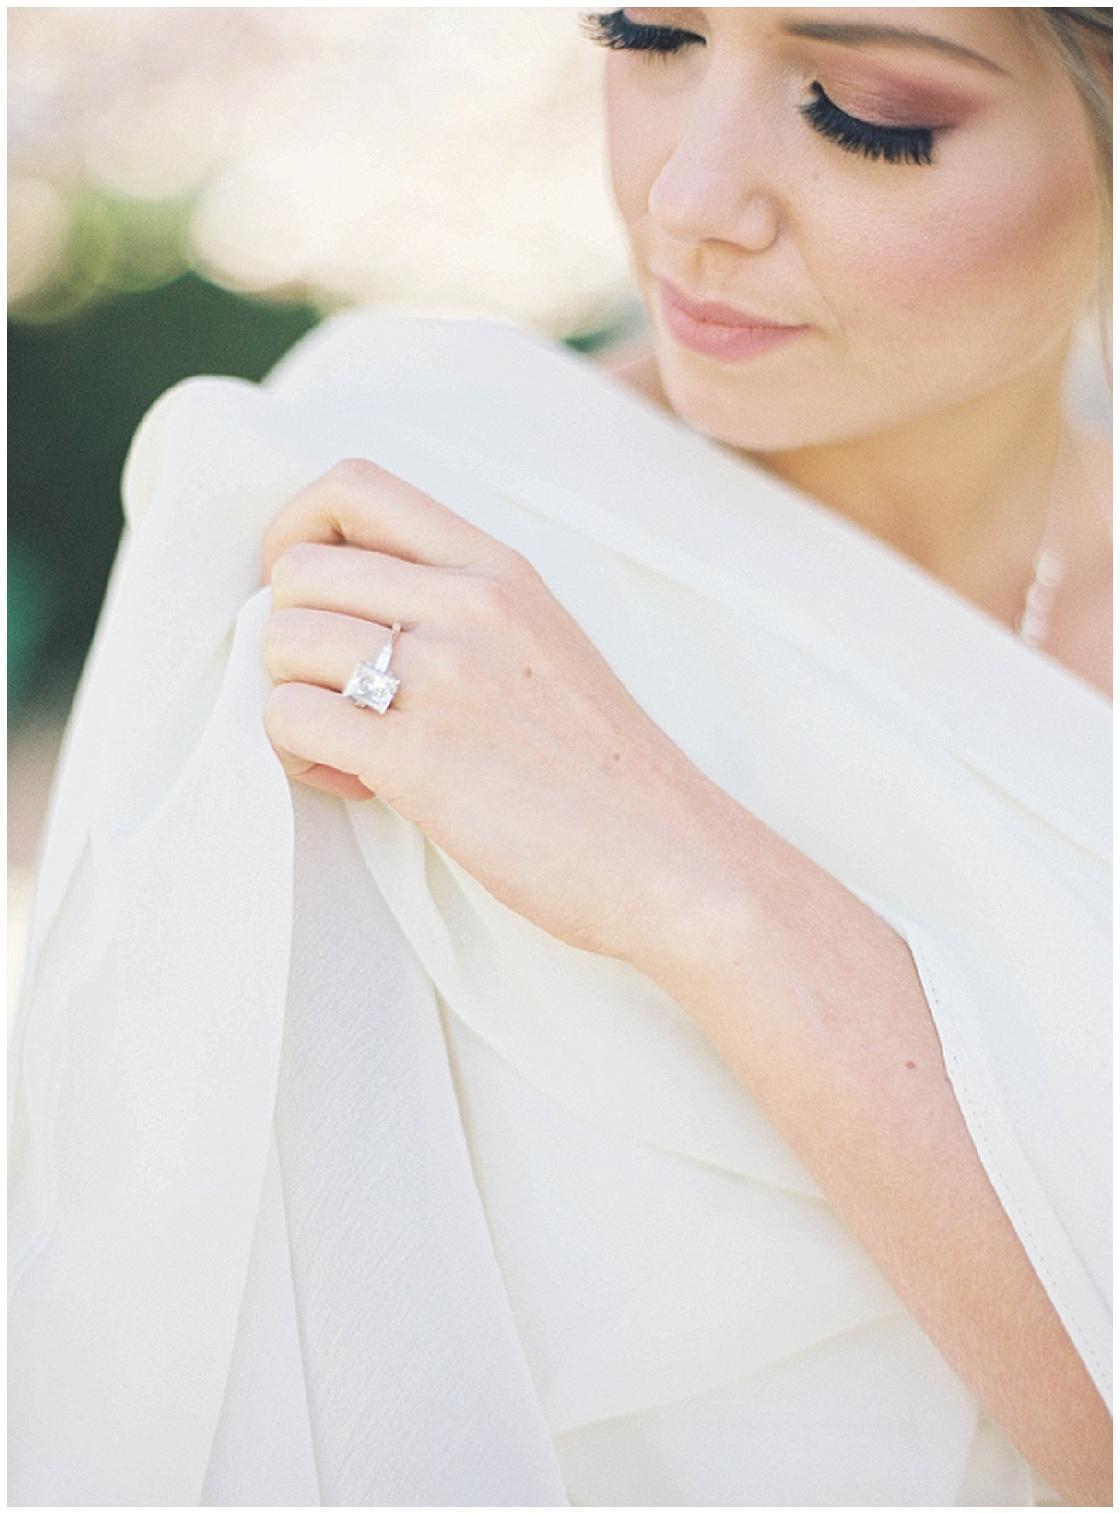 Magnolia Inspired Shoot | Jenna Hill Photography | Spring Wedding | Joy Wed blog | http://www.joy-wed.com